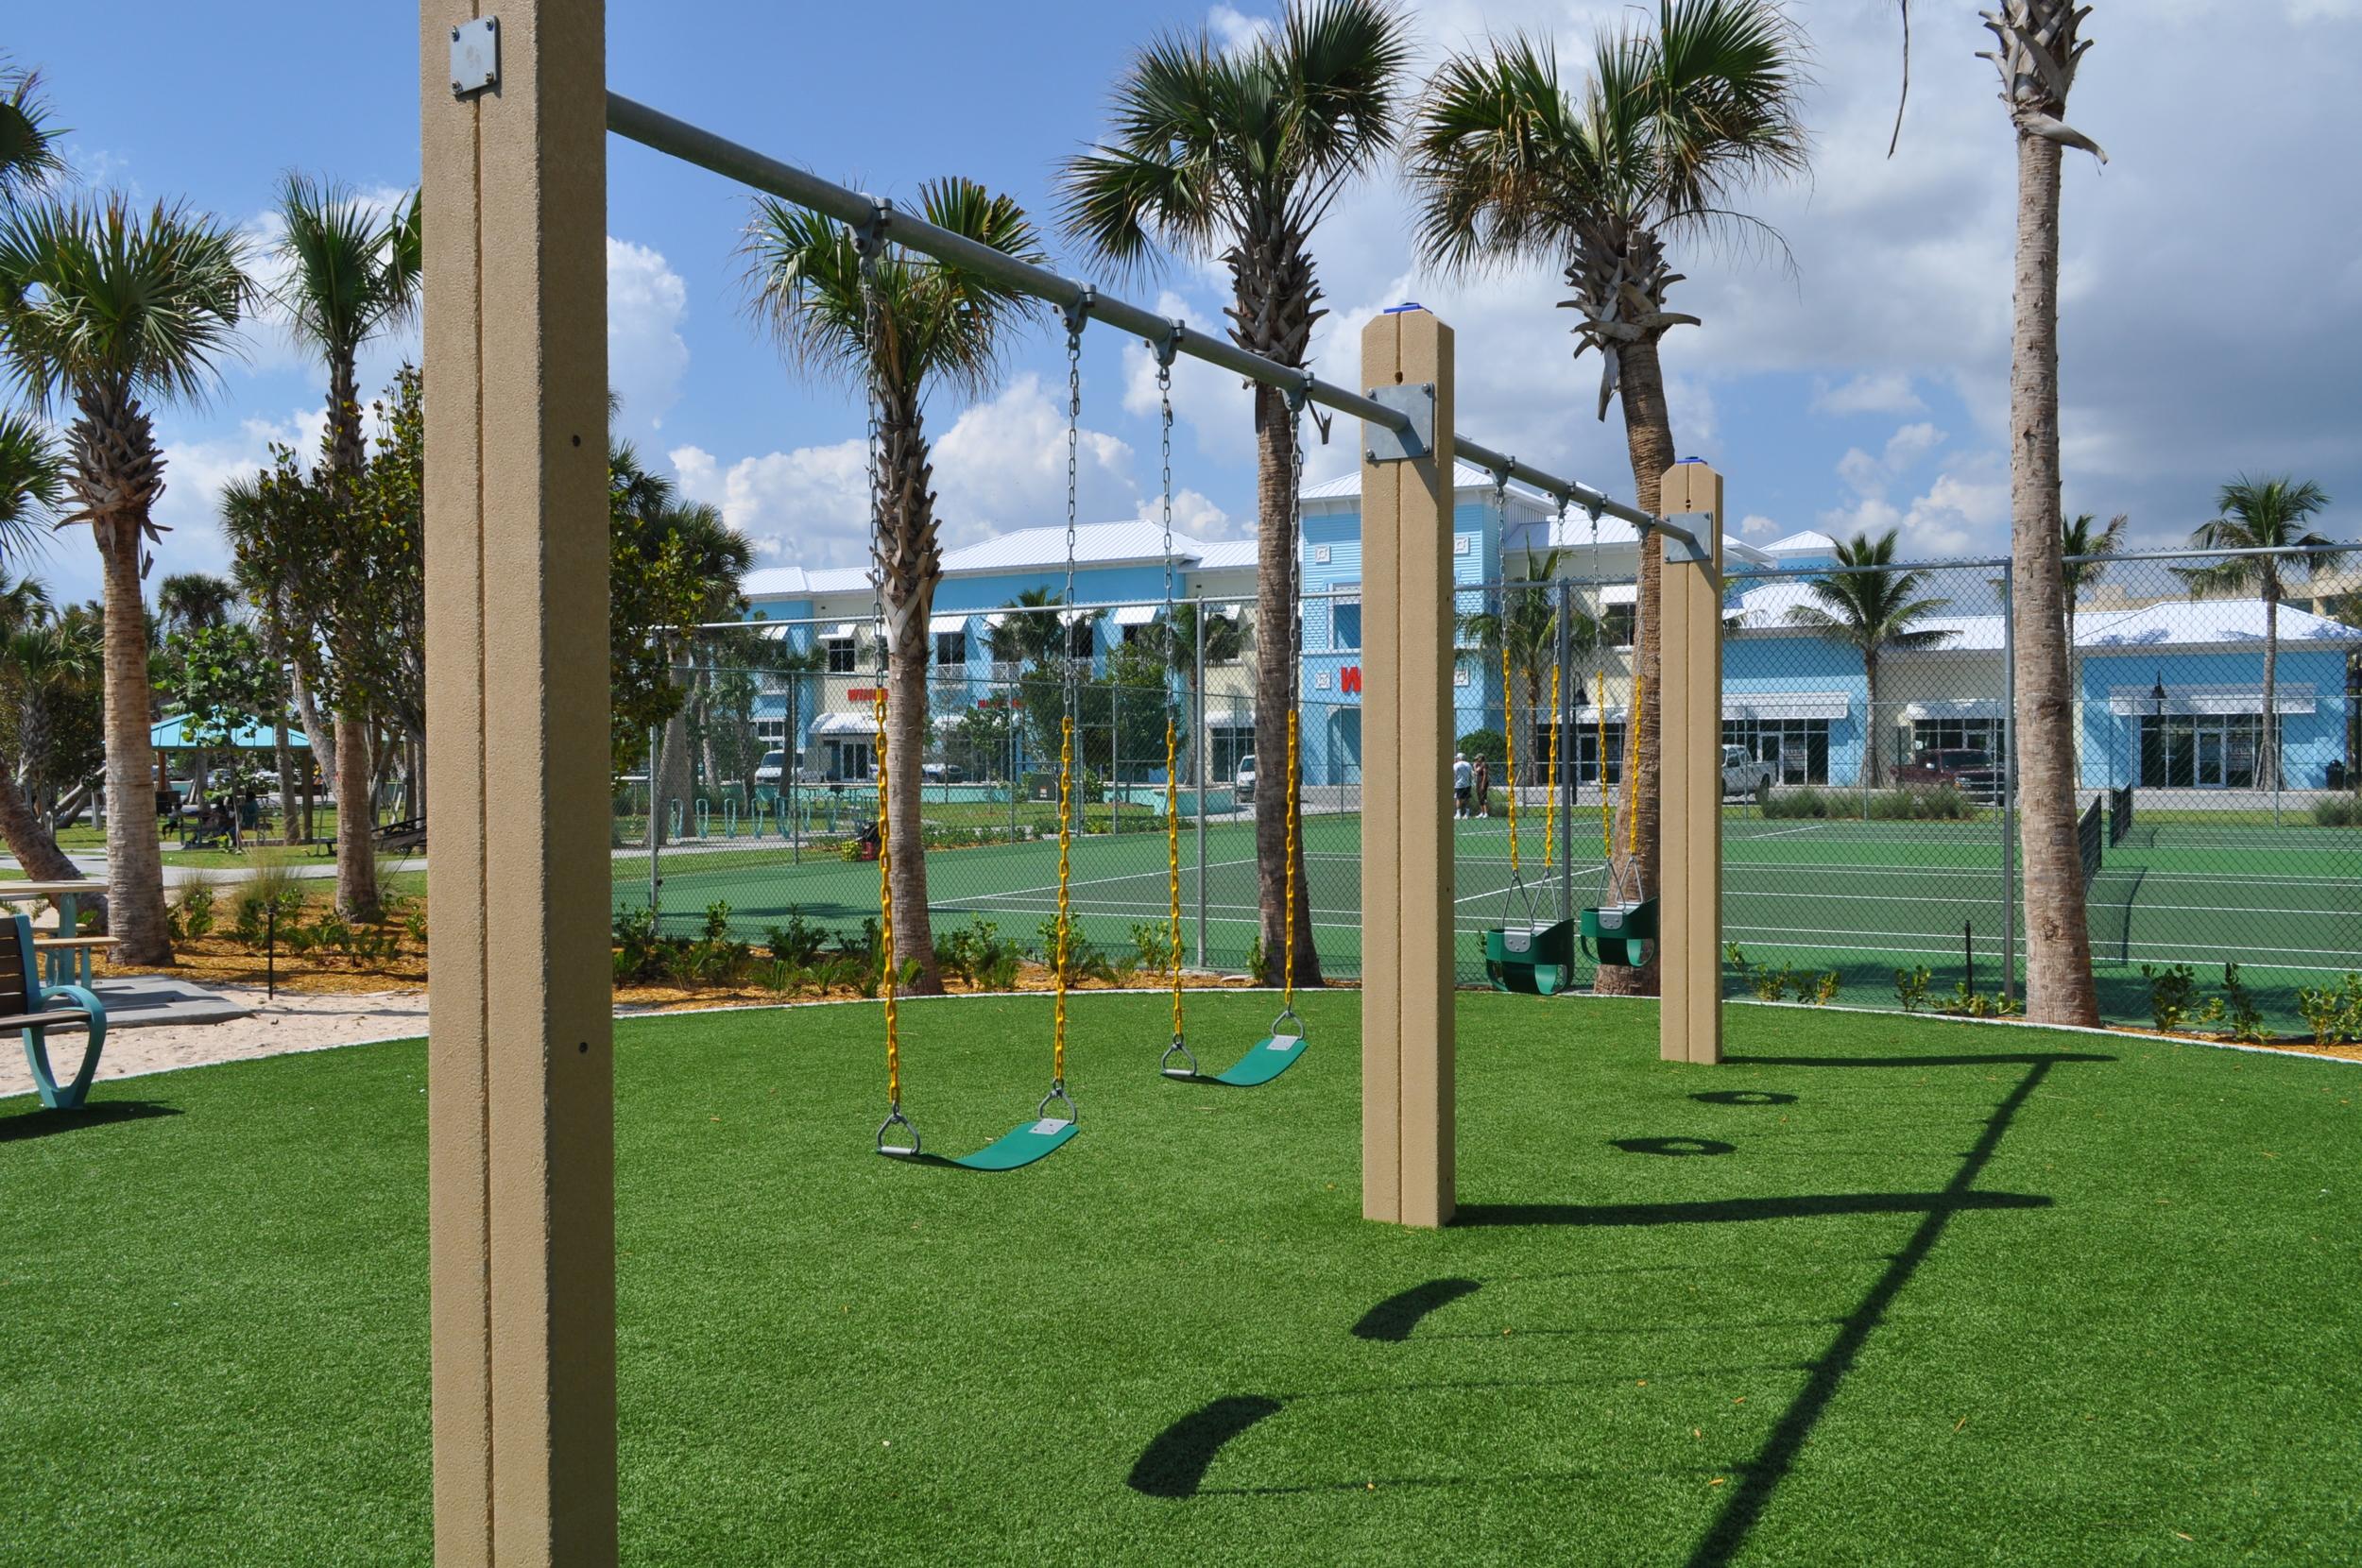 City of Riviera Beach Municipal Beach Park Ocean Mall Playground Swings.jpg